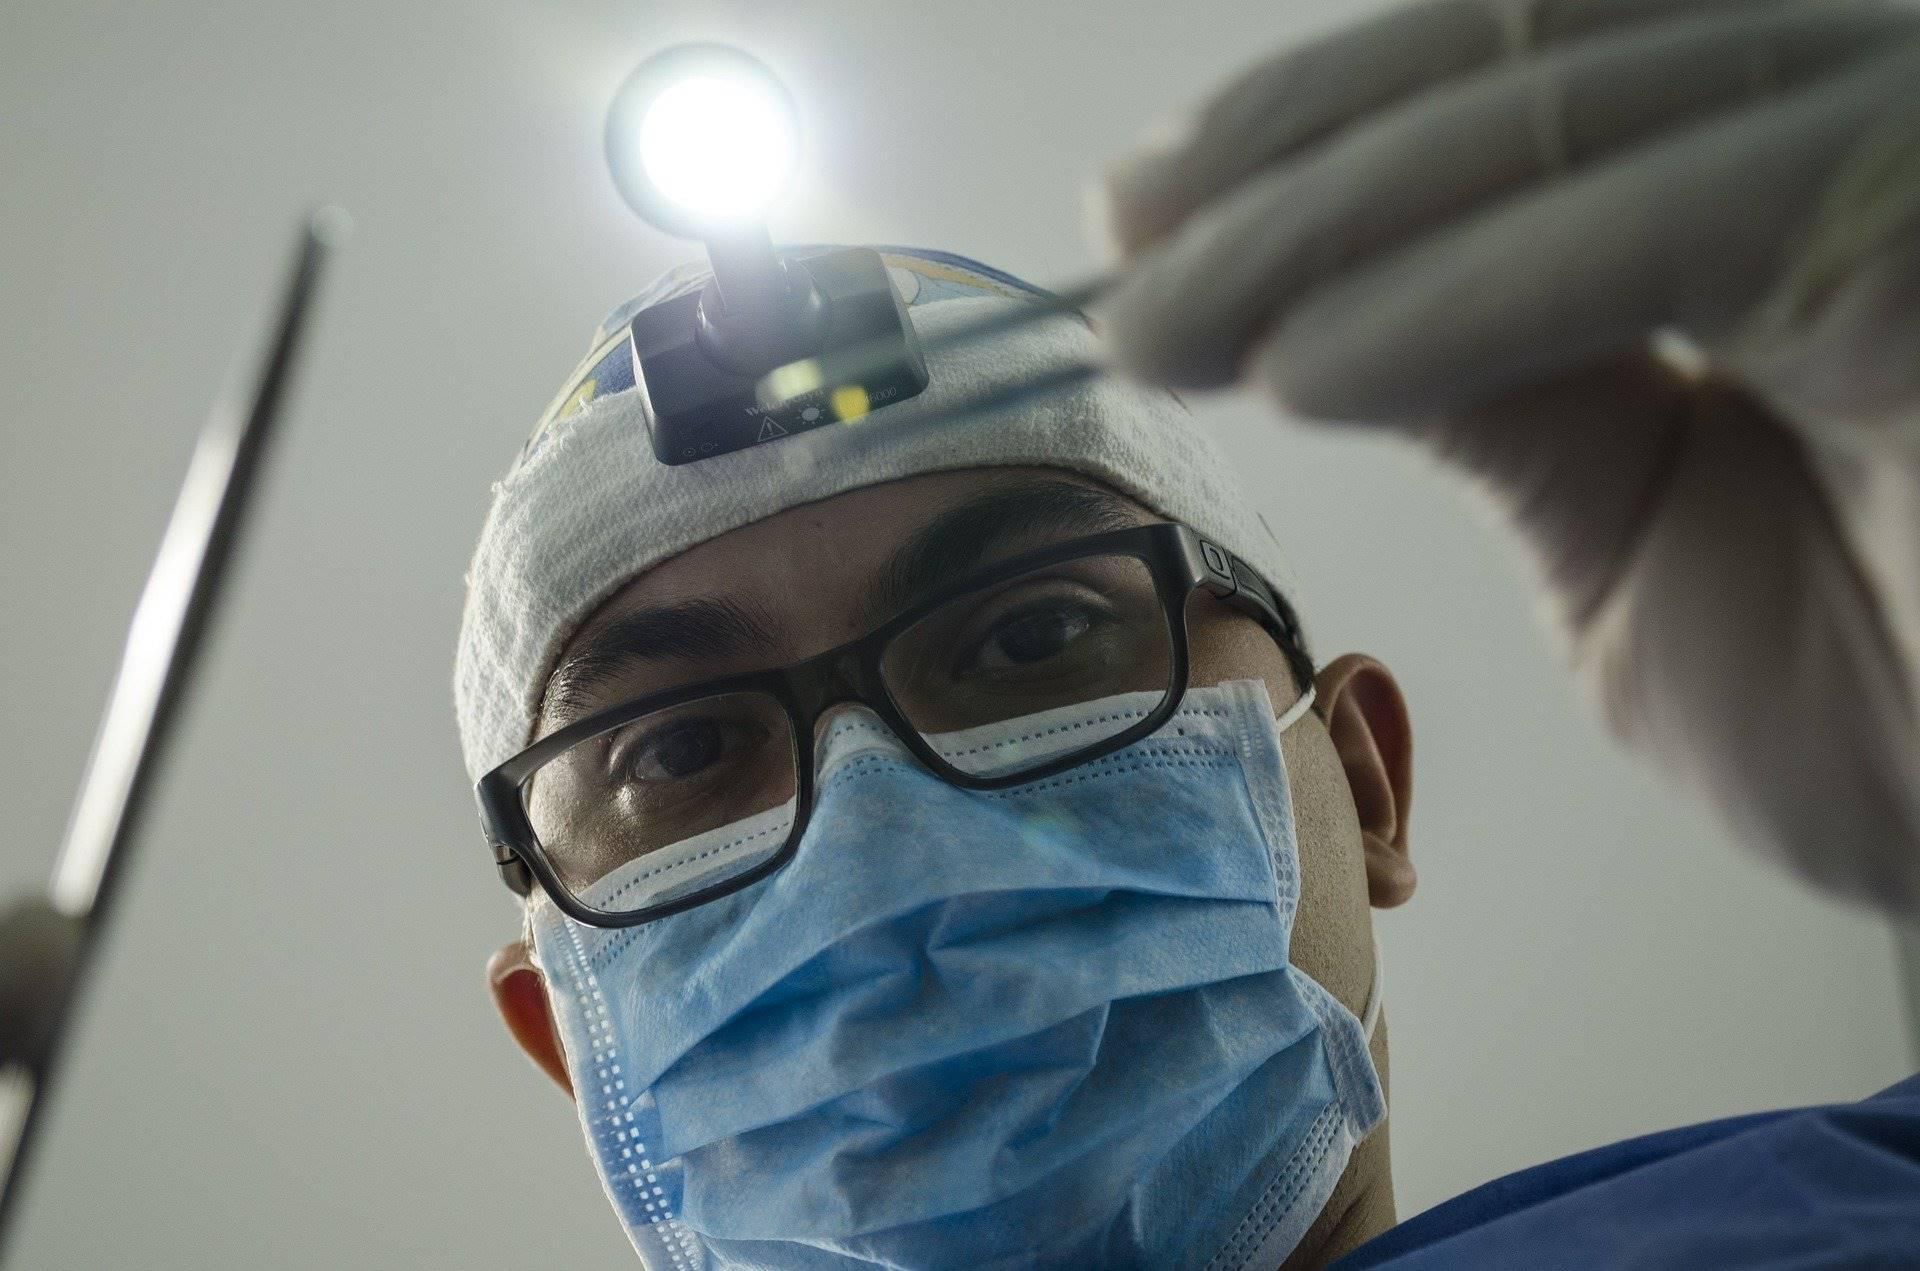 'Premie tandarts vaak hoger dan daadwerkelijke kosten'